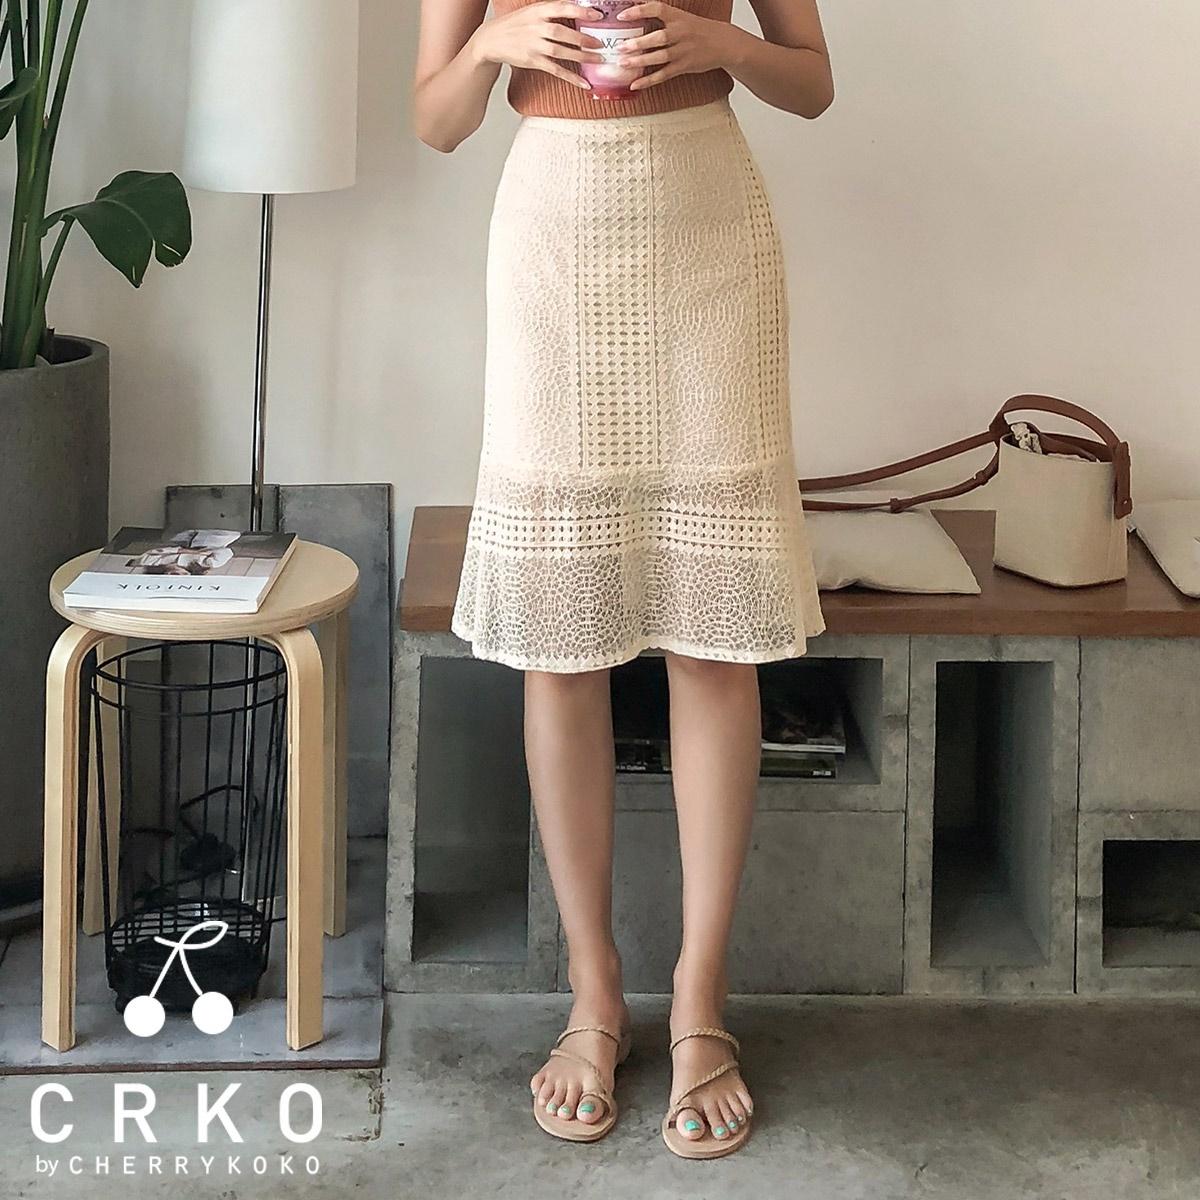 [CHERRYKOKO官方旗艦店] H-line蕾絲裙 / be rumi skirt